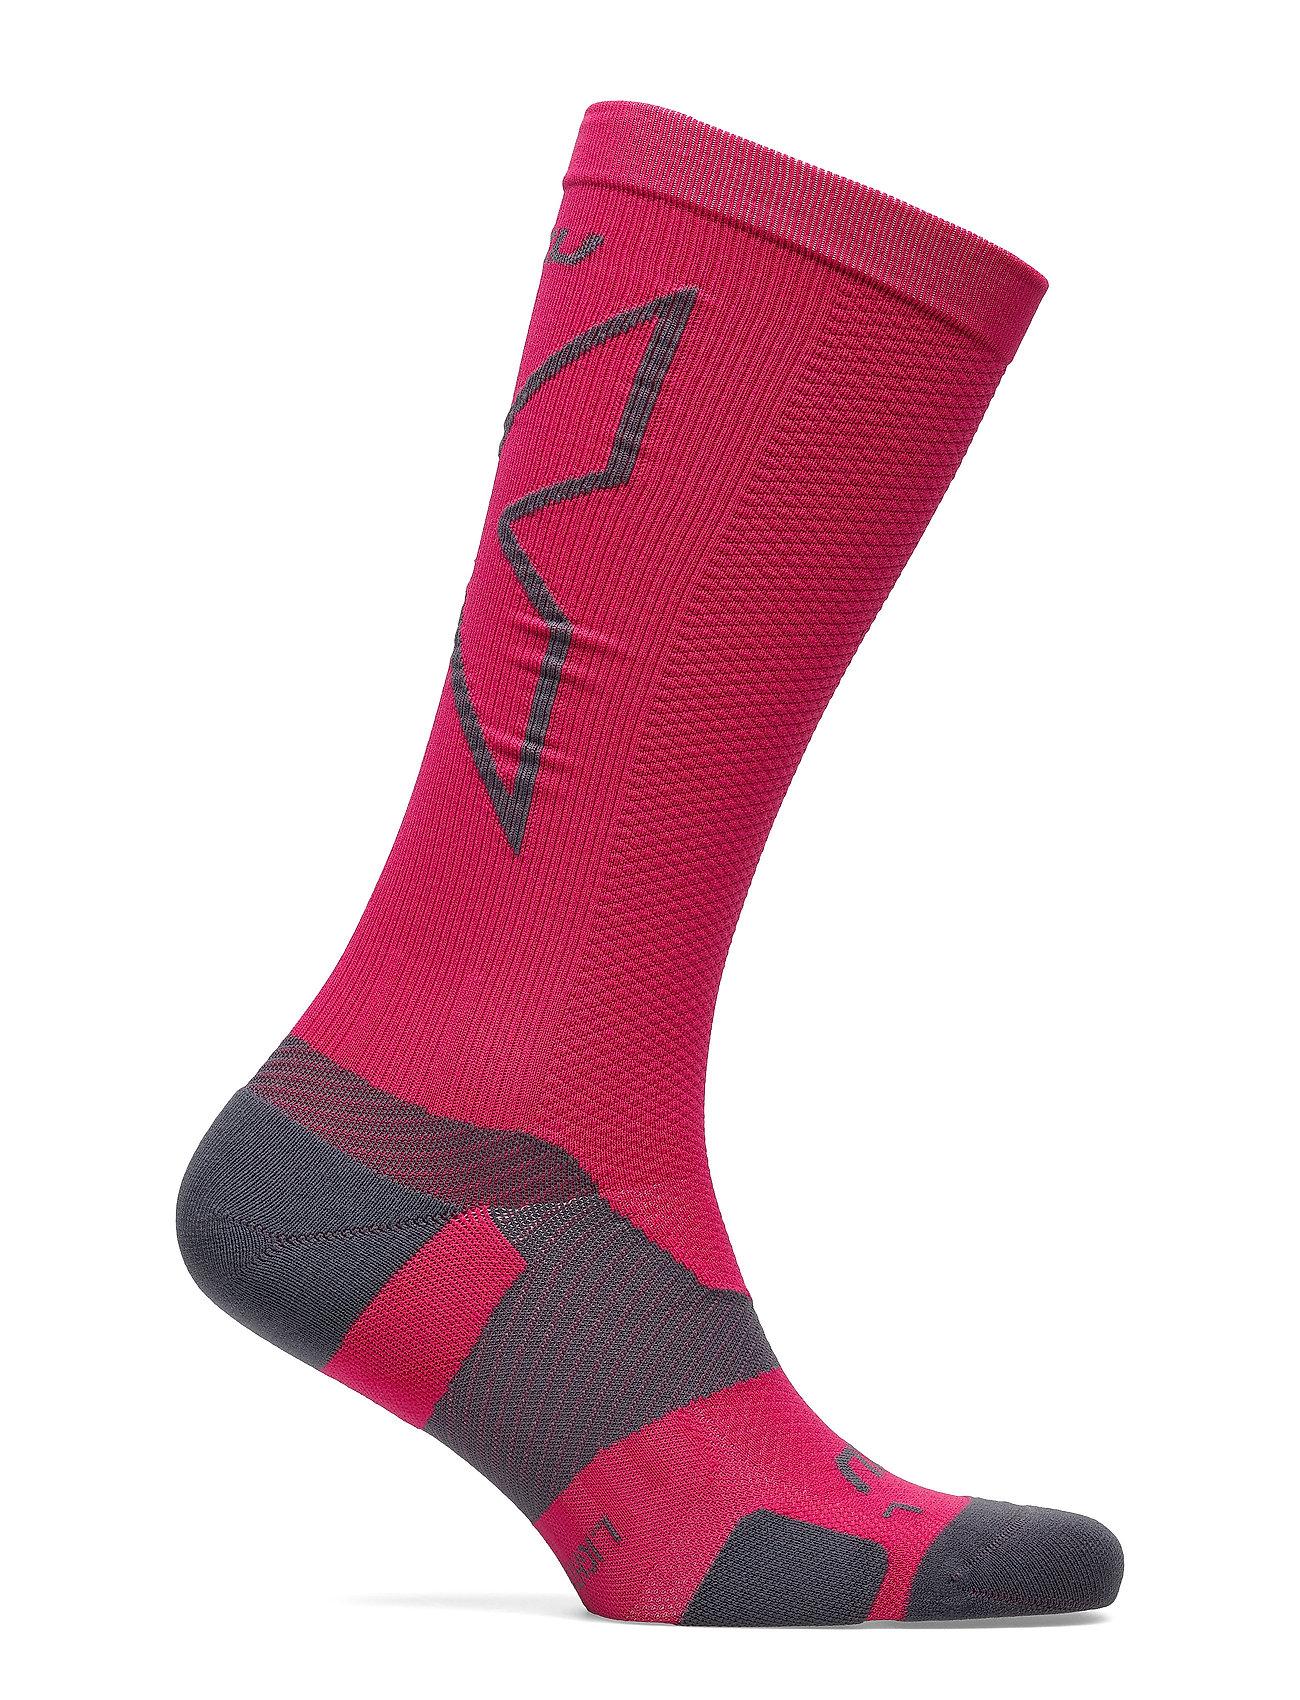 2XU - VECTR LIGHT CUSHION FULL LENG - sokker - hot pink/grey - 0